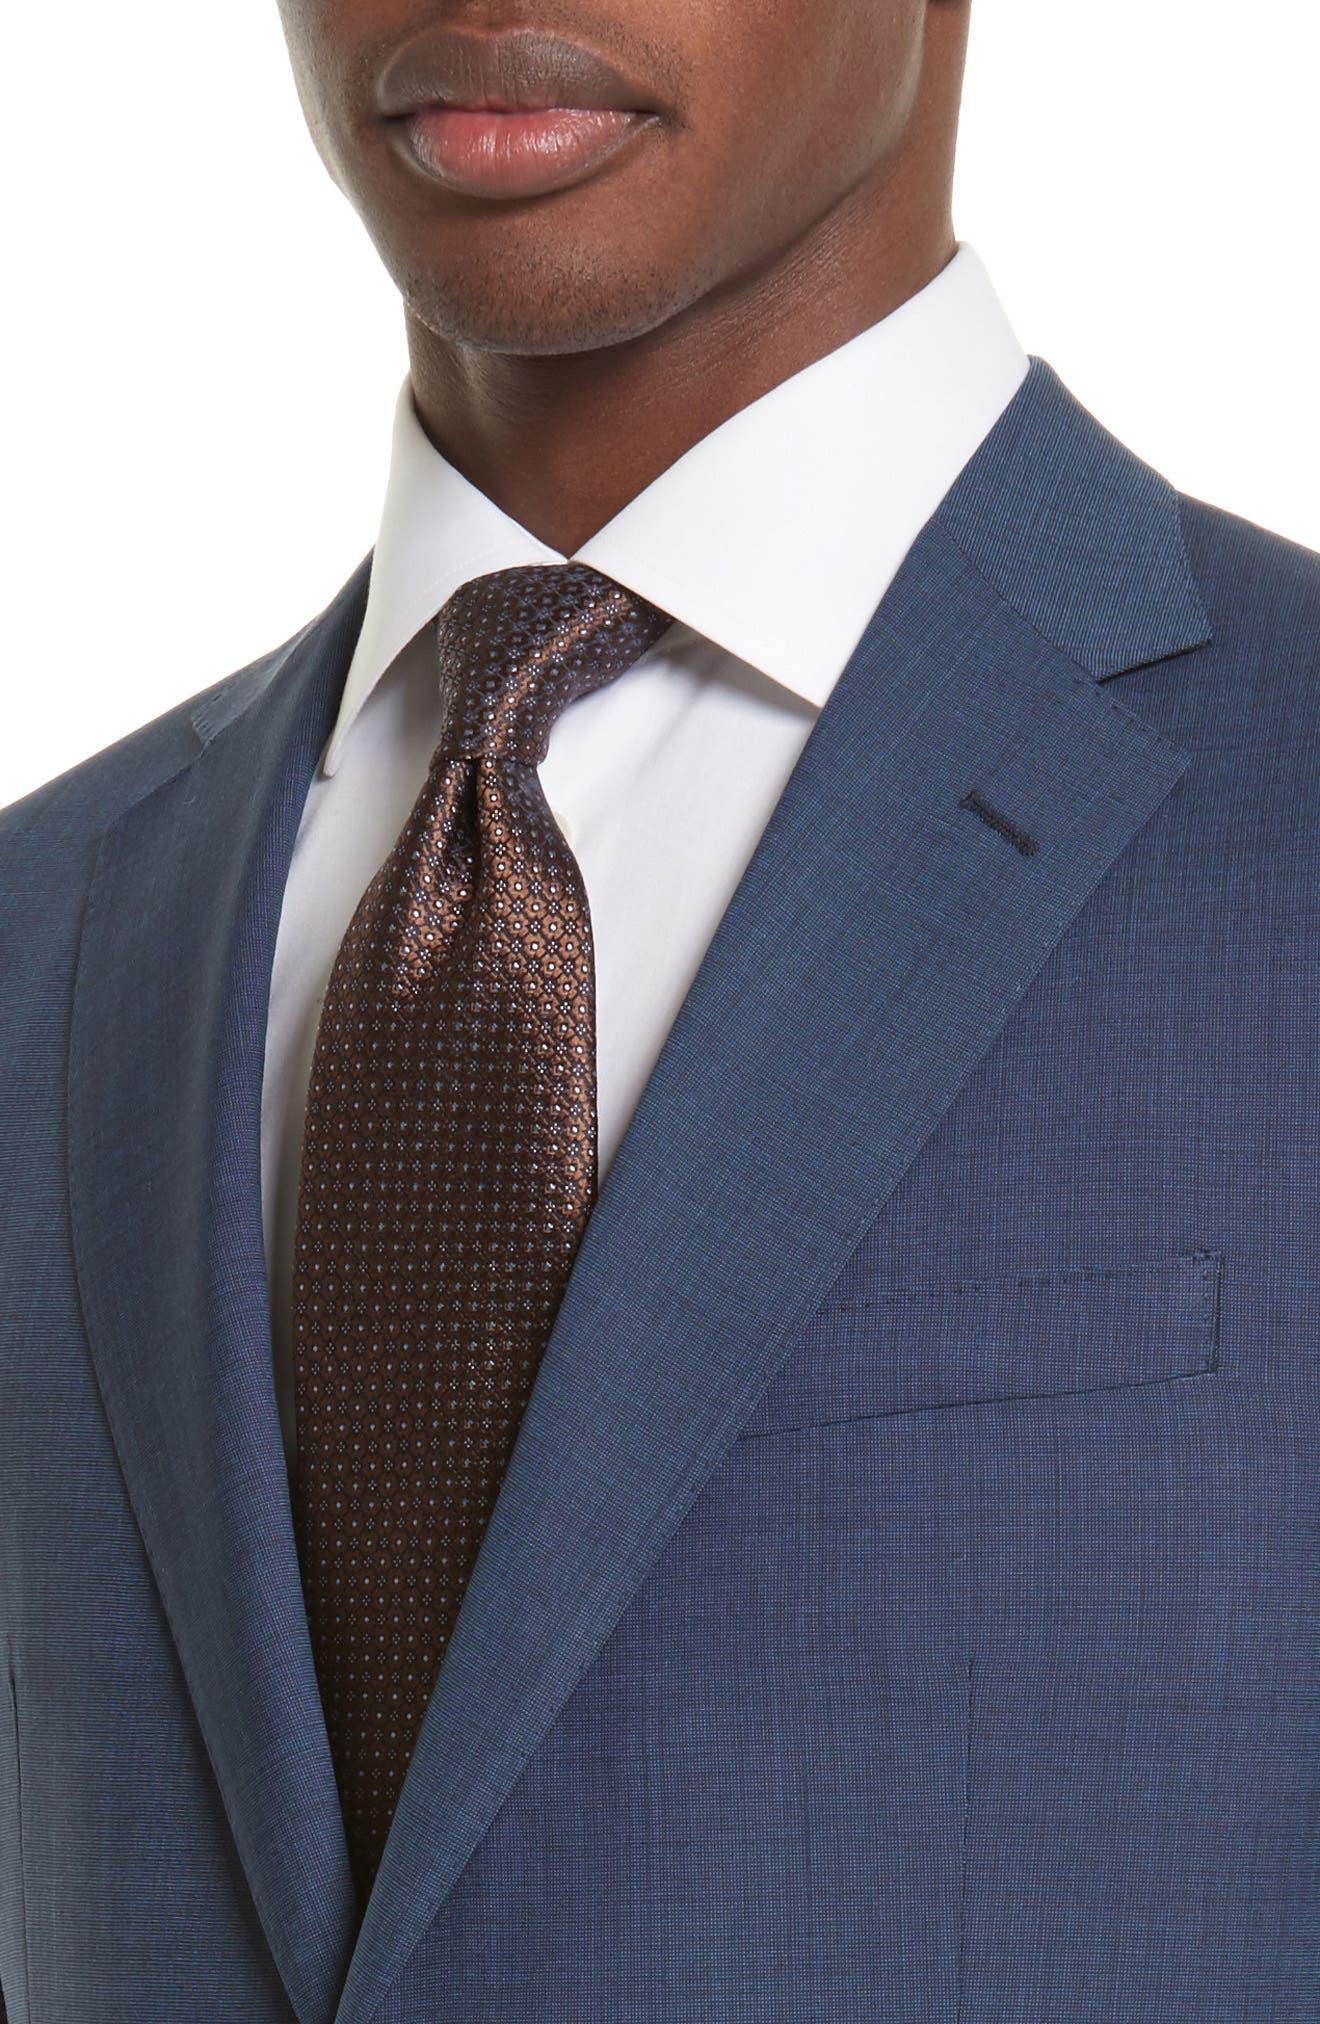 Drop 7 Trim Fit Solid Wool & Silk Suit,                             Alternate thumbnail 4, color,                             Navy